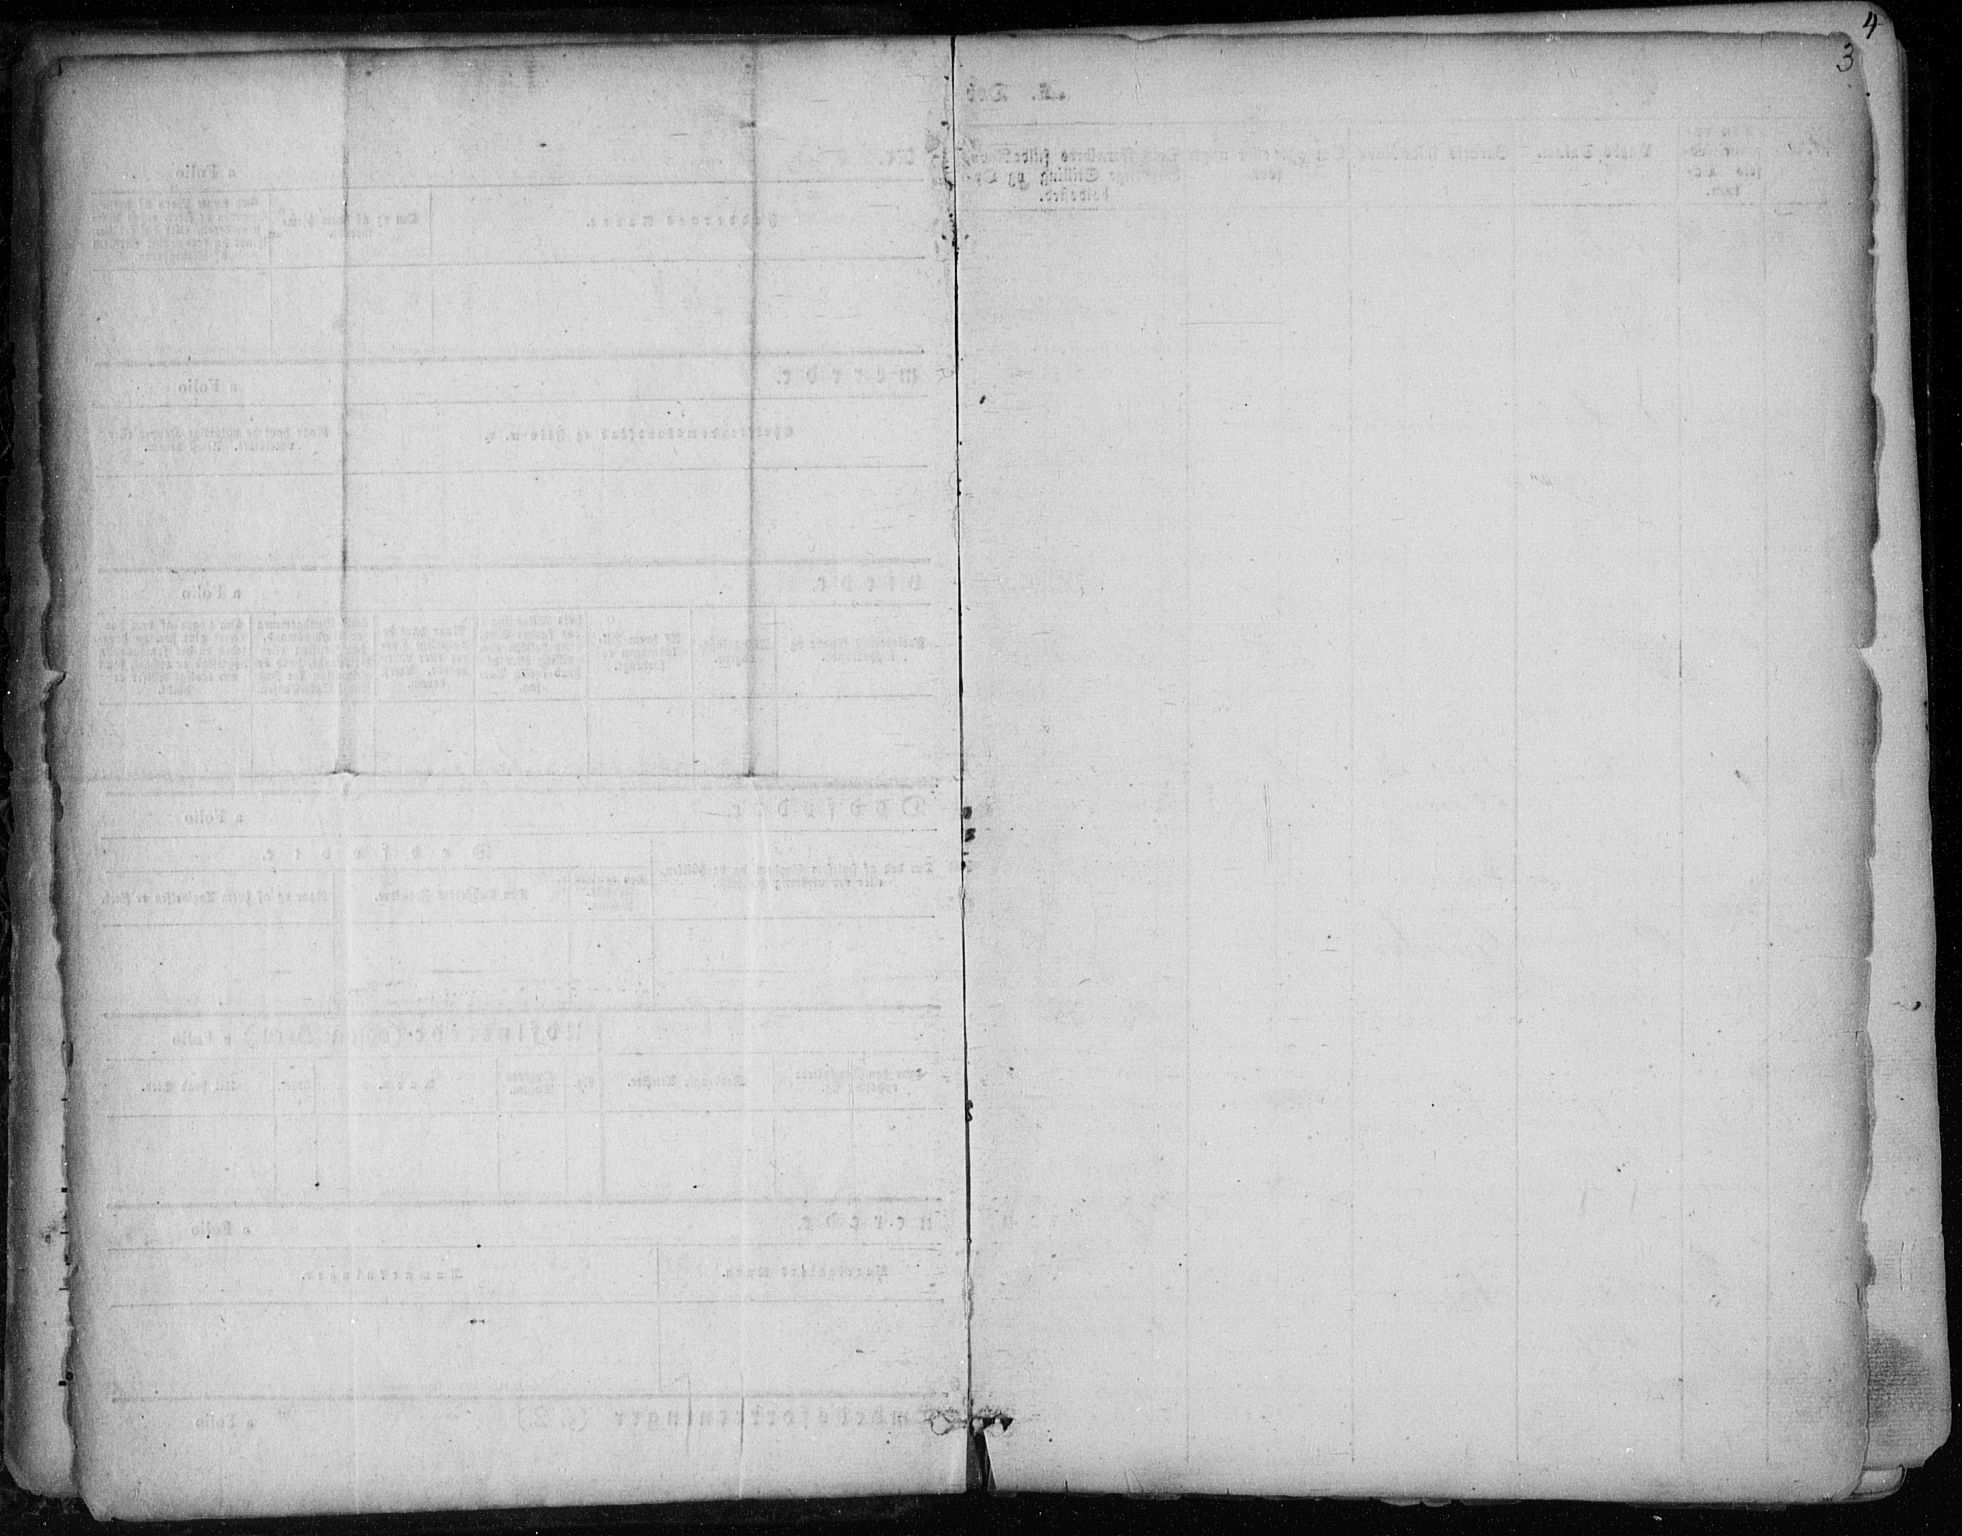 SAKO, Holla kirkebøker, F/Fa/L0005: Ministerialbok nr. 5, 1849-1860, s. 3